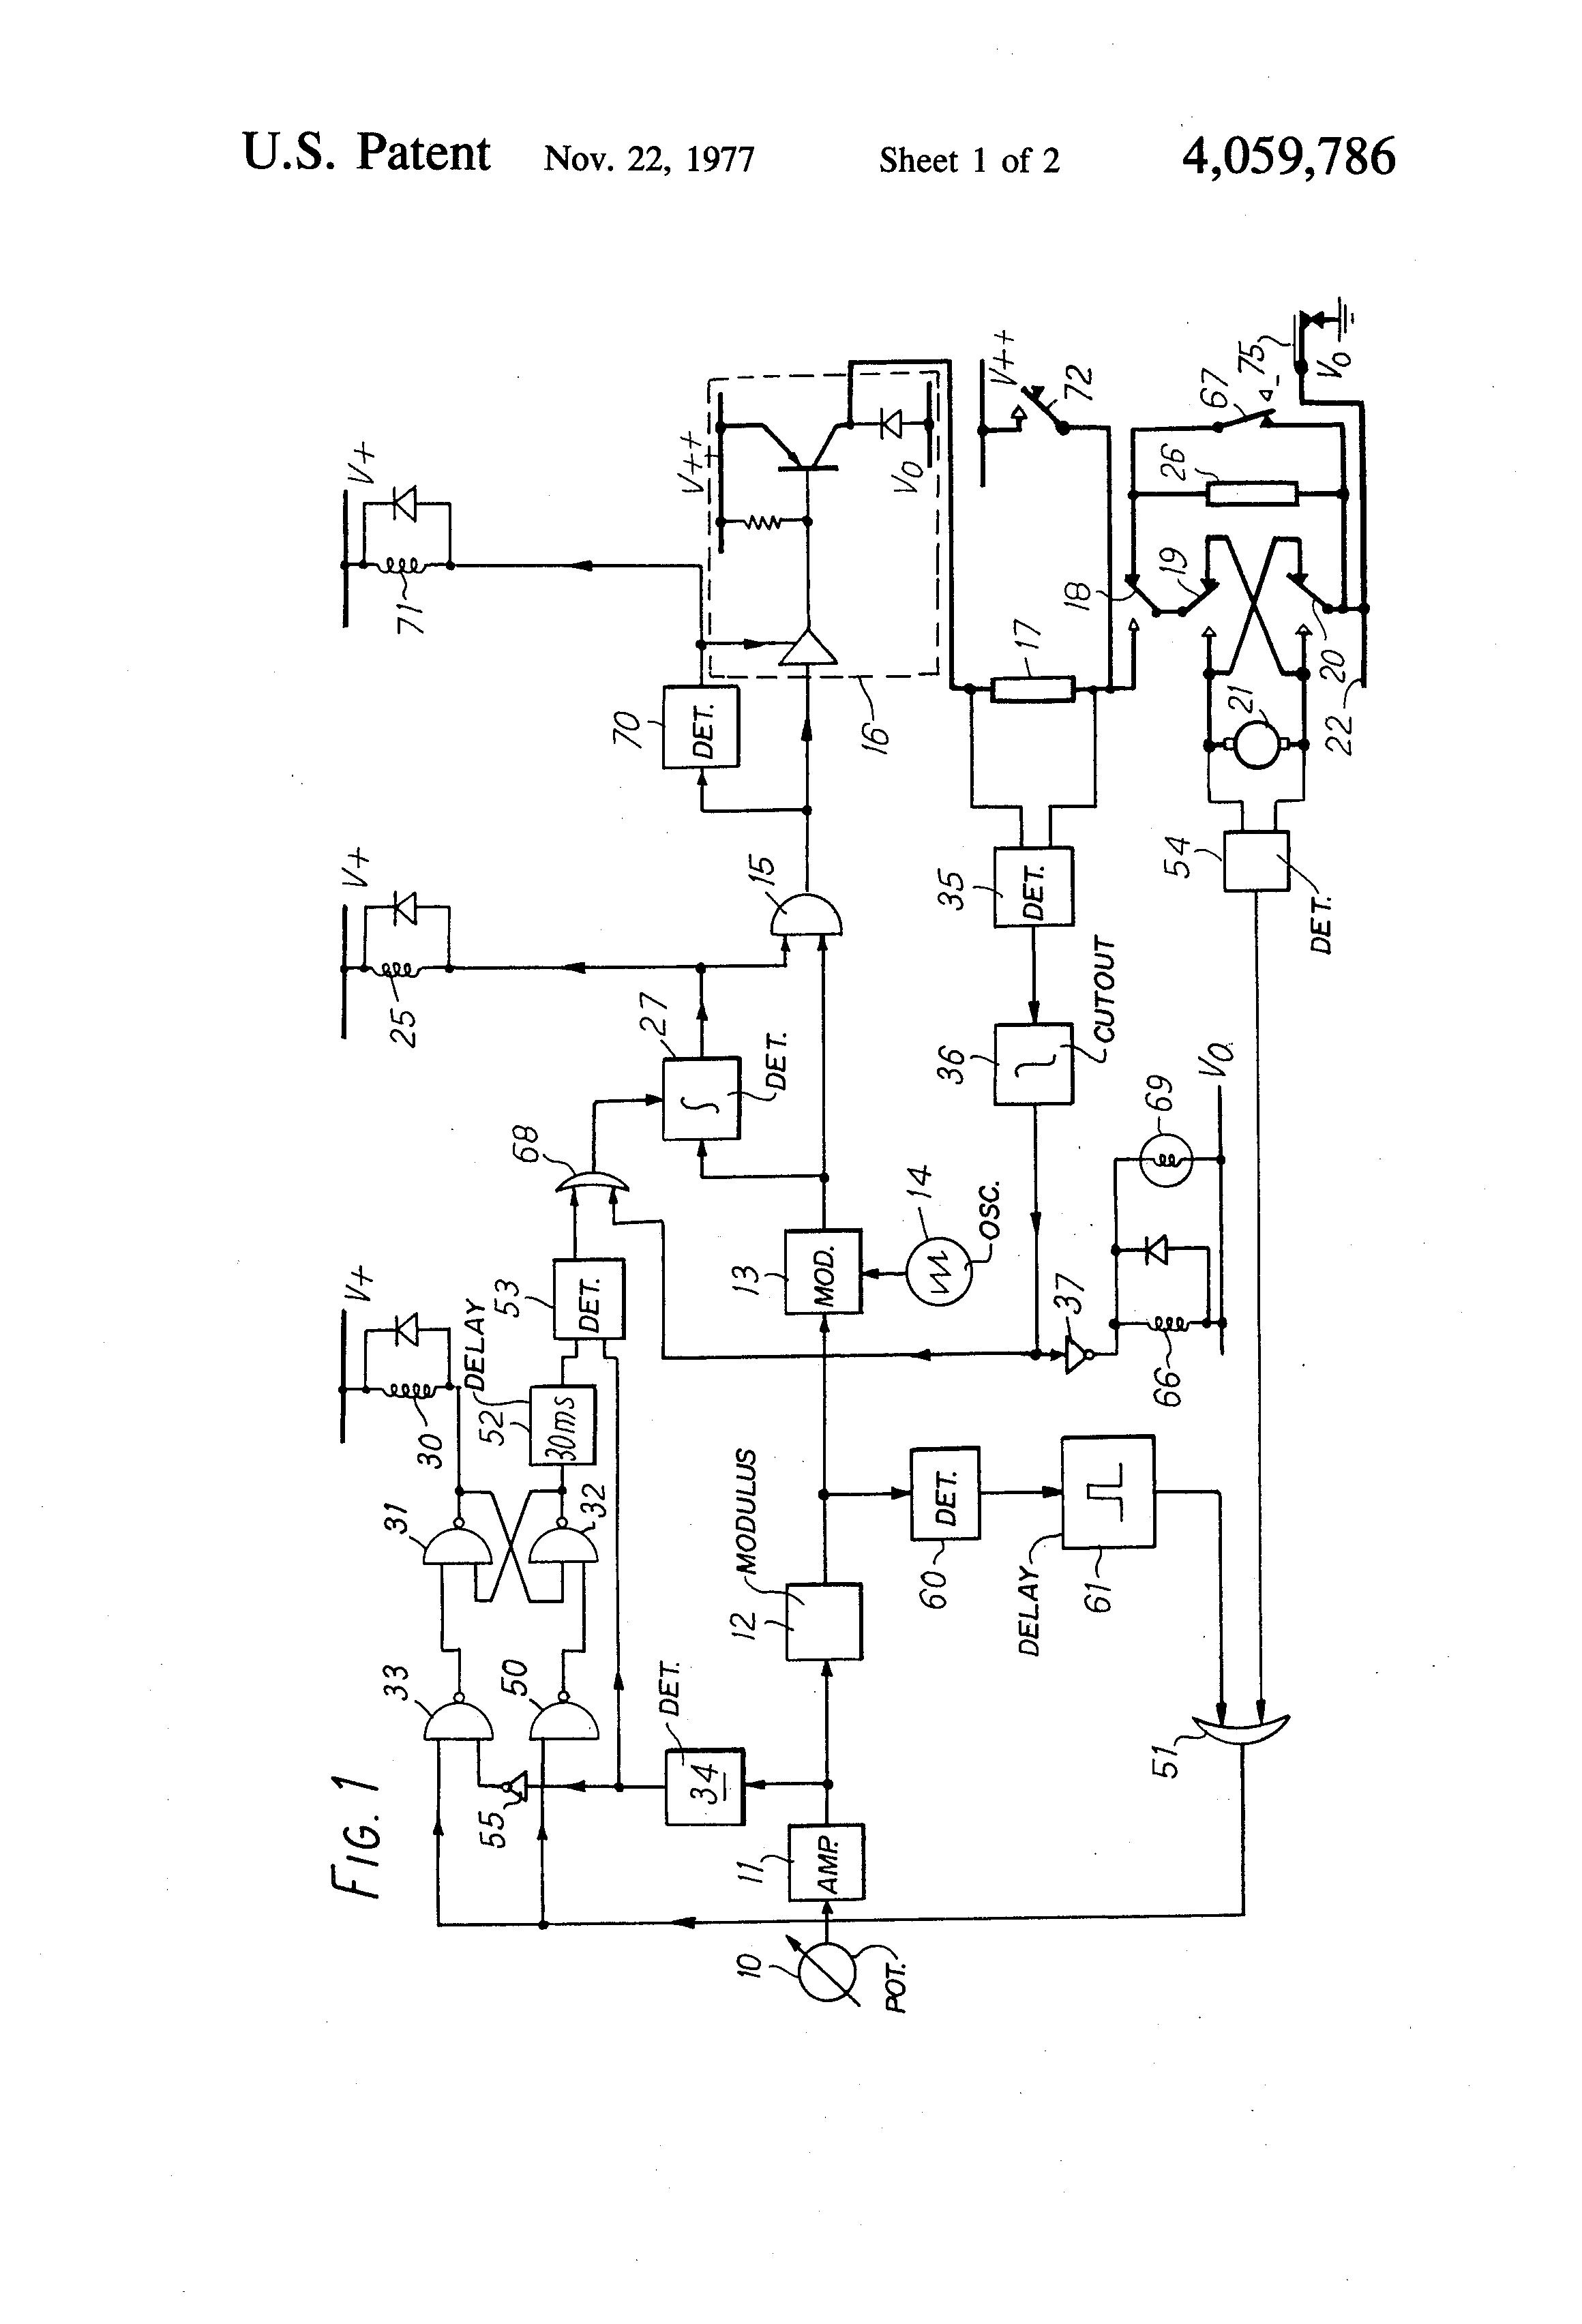 1999 C280 Wiring Diagram Printable Wiring Diagram Schematic Harness